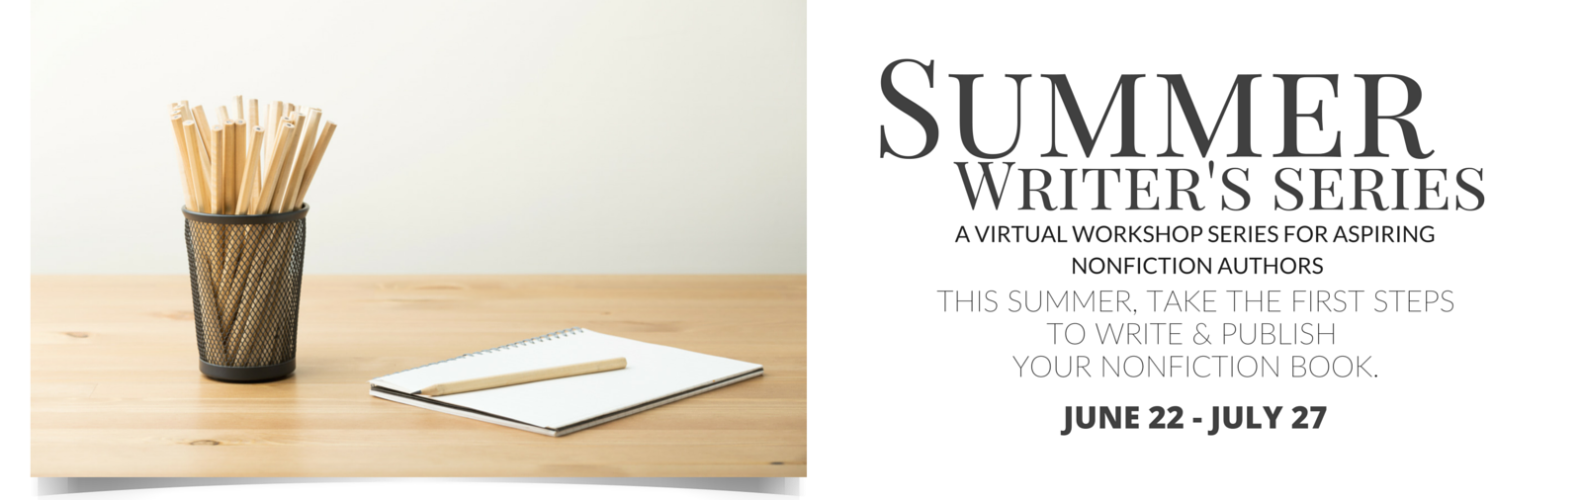 summer writing Summer Writer's Series-nonfiction book writing group class